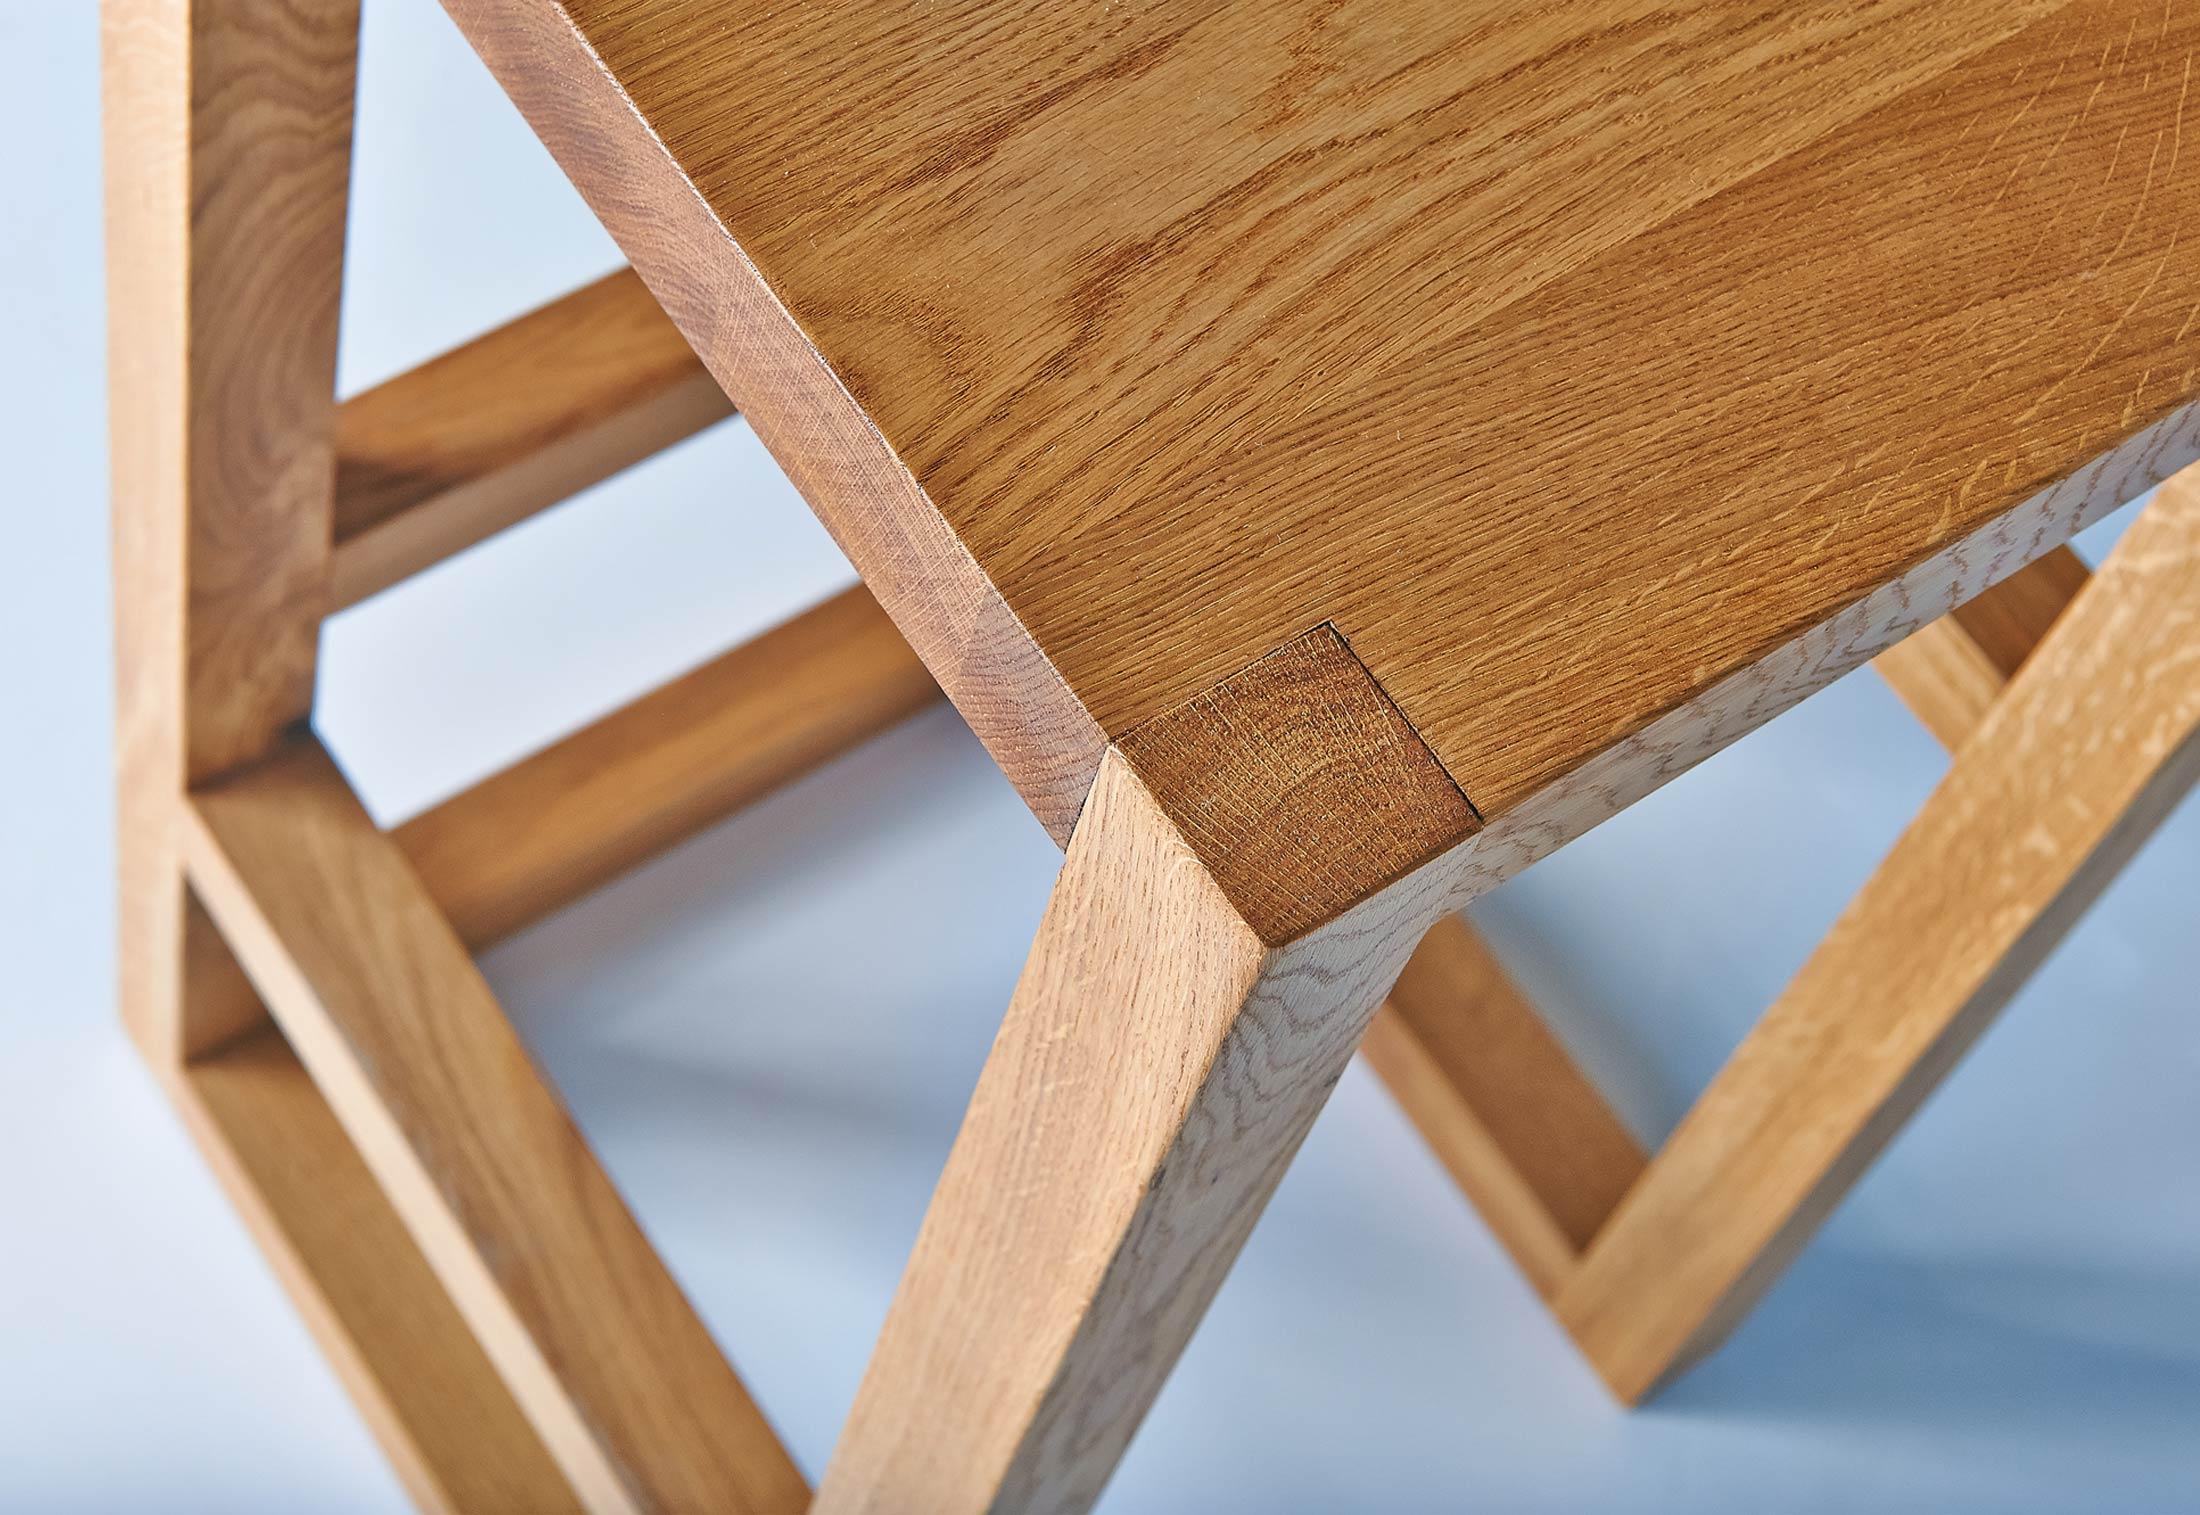 Step bar stool by vitamin design STYLEPARK : step bar stool 5 from www.stylepark.com size 2200 x 1515 jpeg 387kB